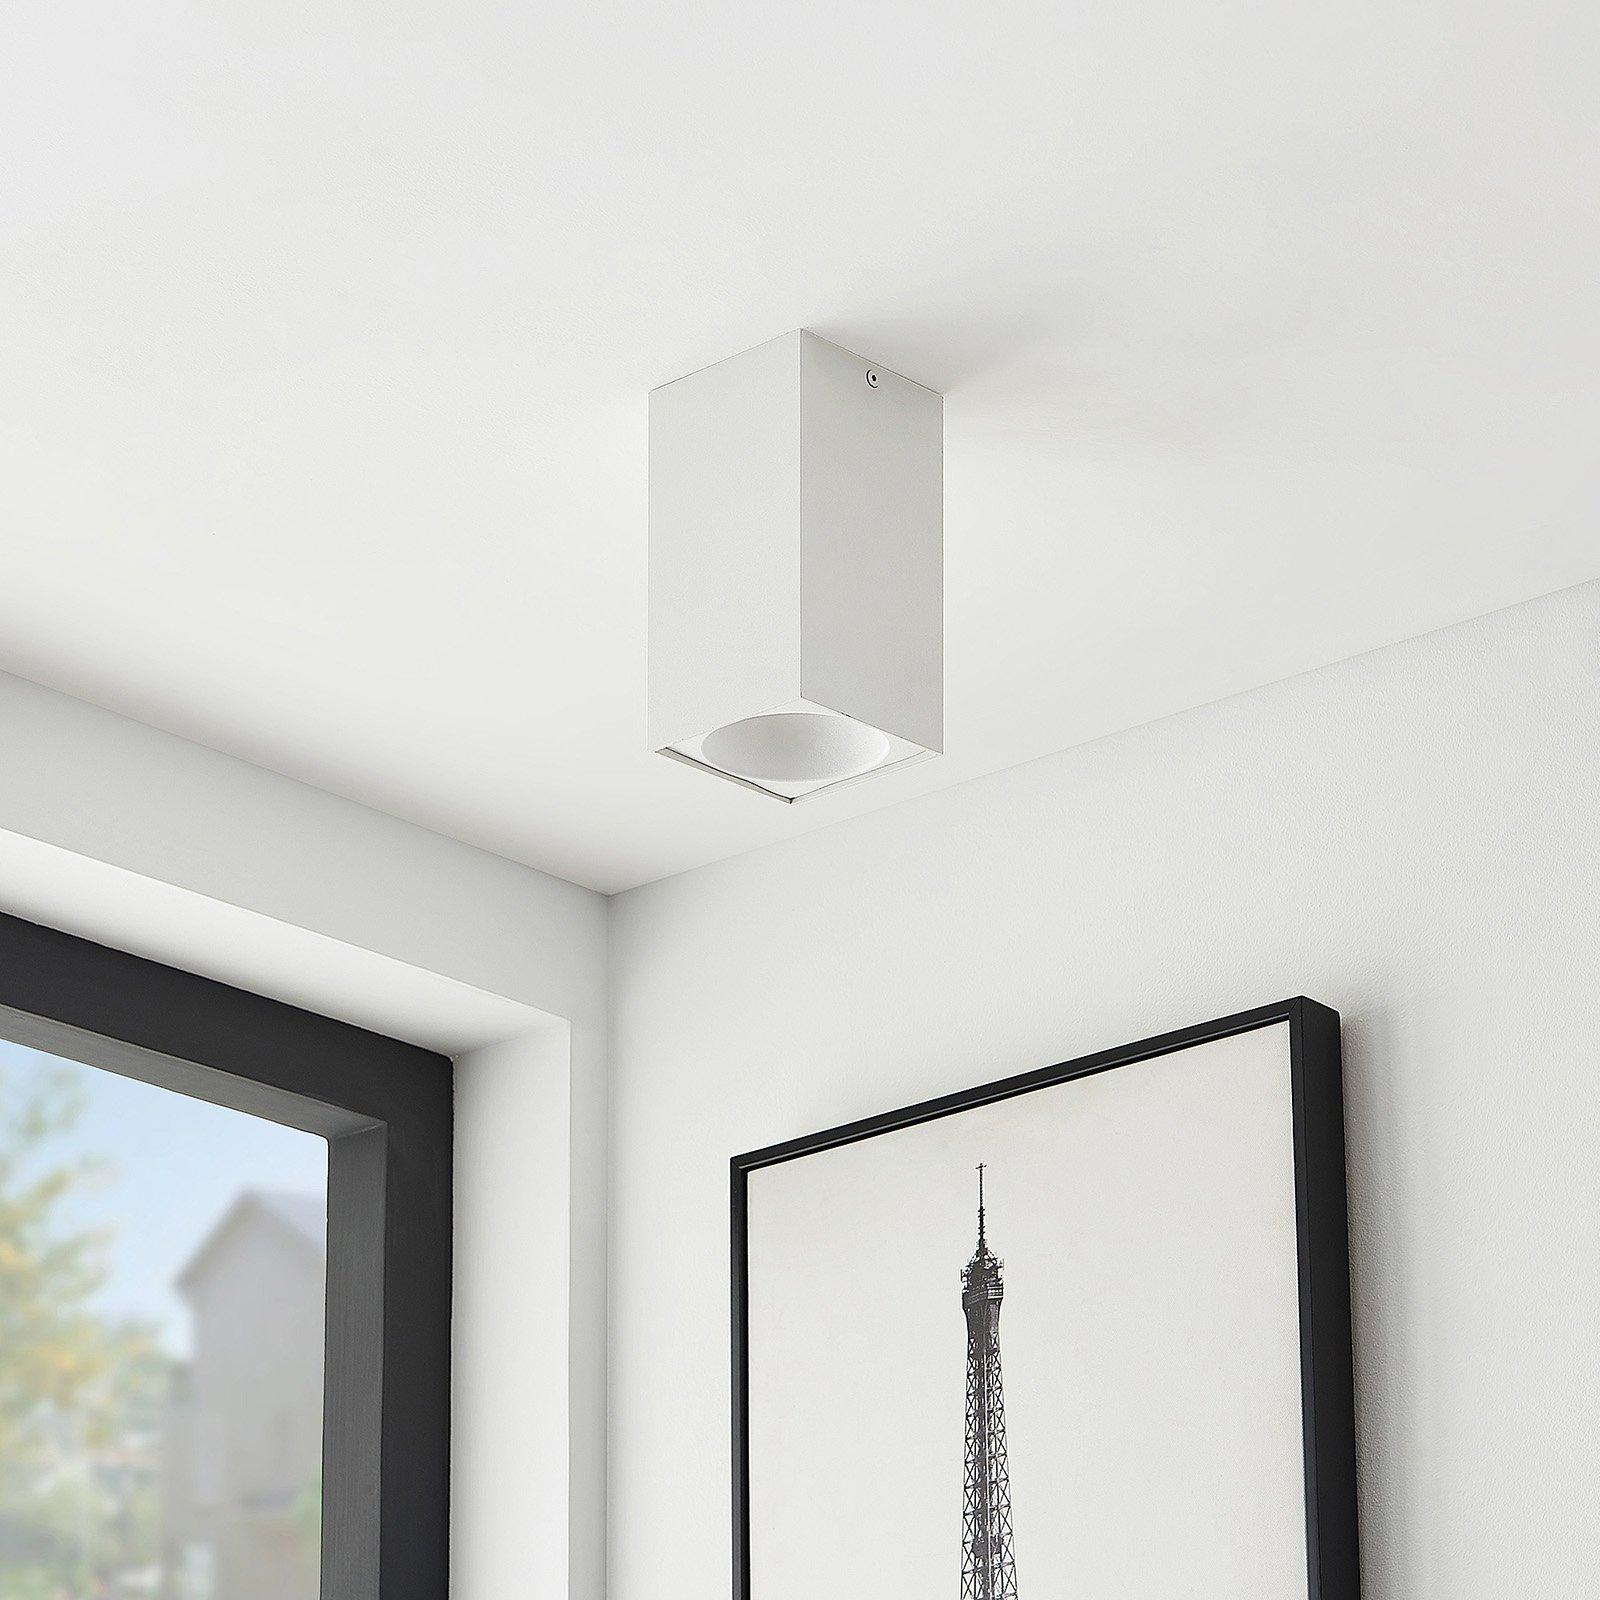 Arcchio Hinka taklampe, kantet, 18 cm, hvit